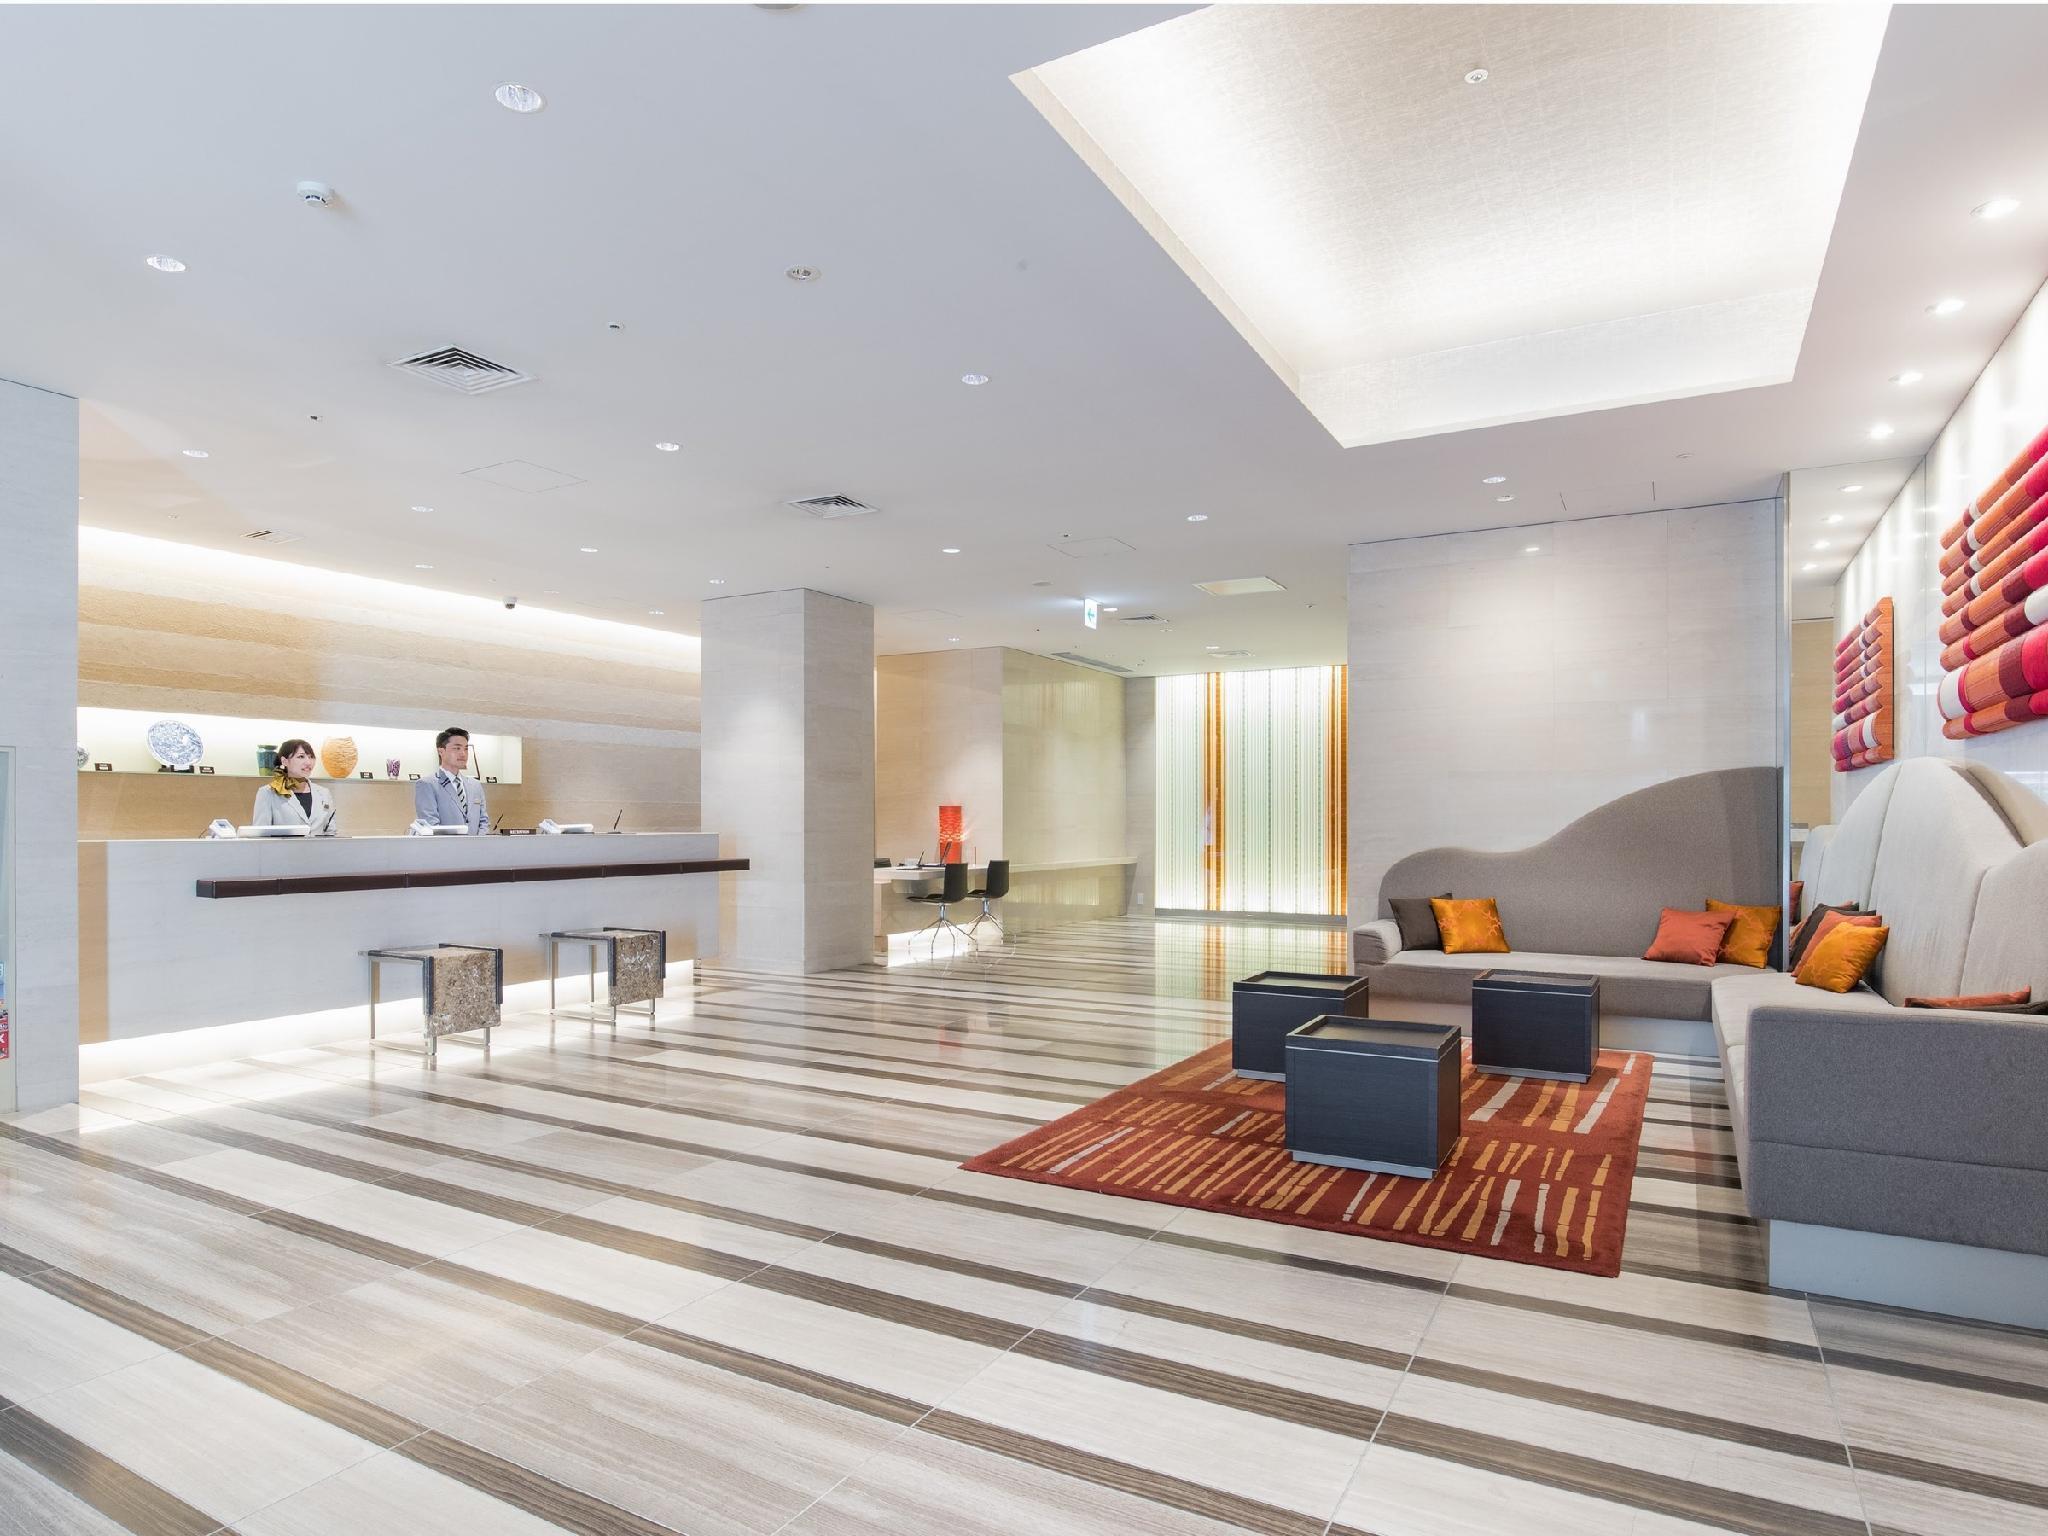 JR九州ホテル ブラッサム博多中央の格安予約・料金比較 Stayway